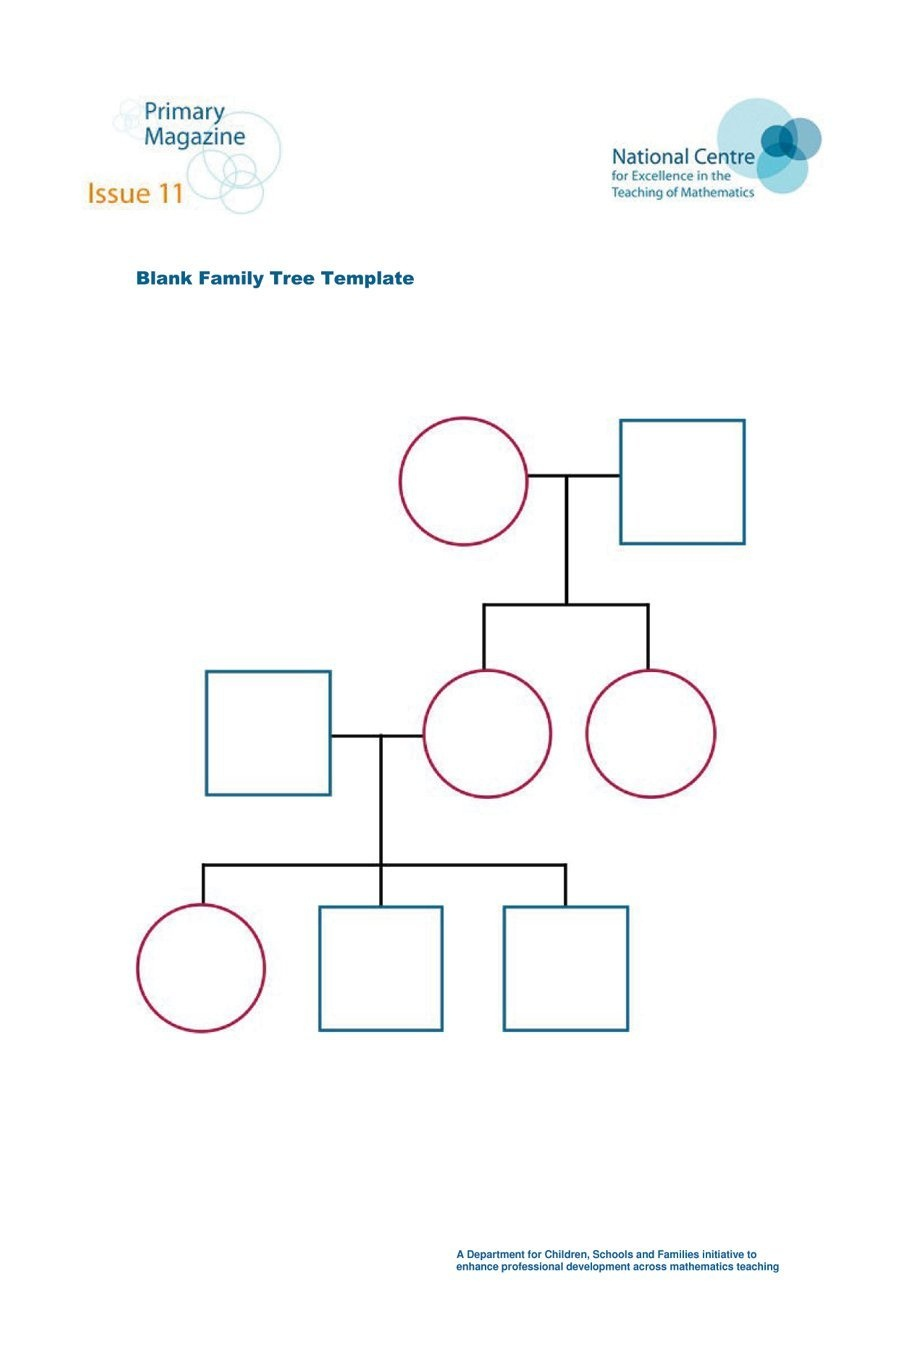 50+ Free Family Tree Templates (Word, Excel, Pdf) ᐅ Template Lab - Family Tree Maker Online Free Printable